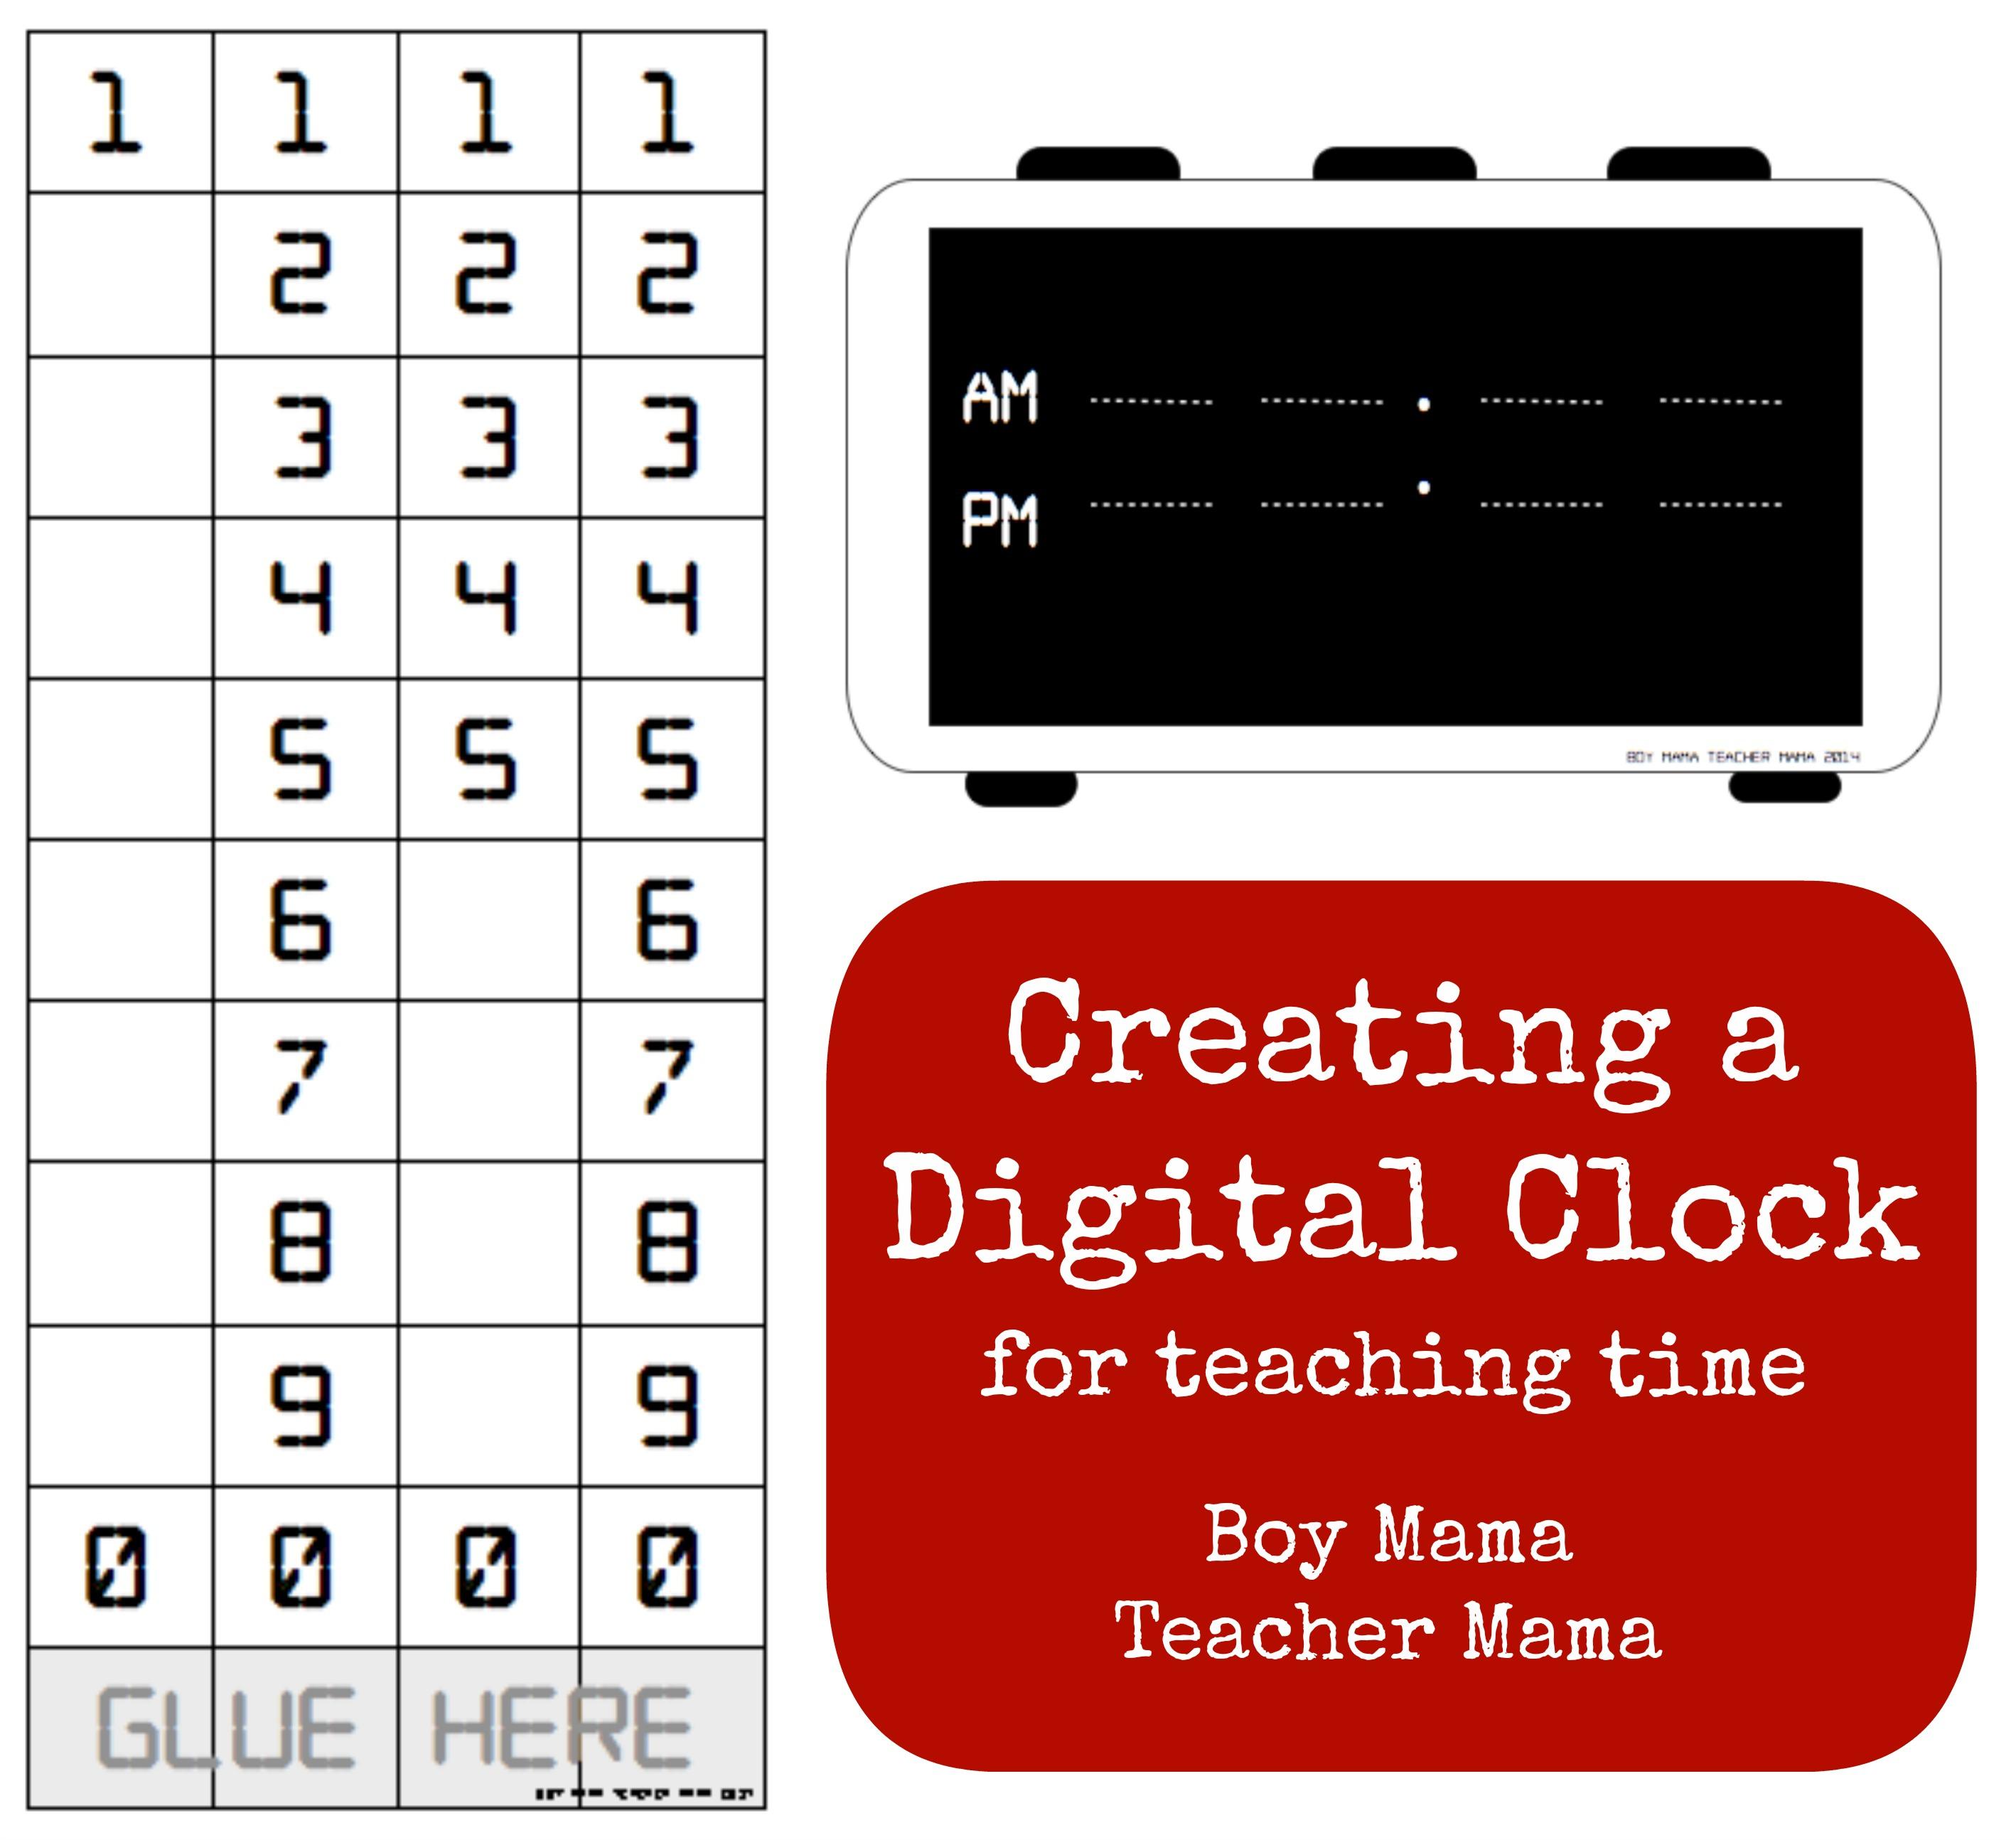 Teacher Mama Creating A Digital Clock For Teaching Time Boy Mama